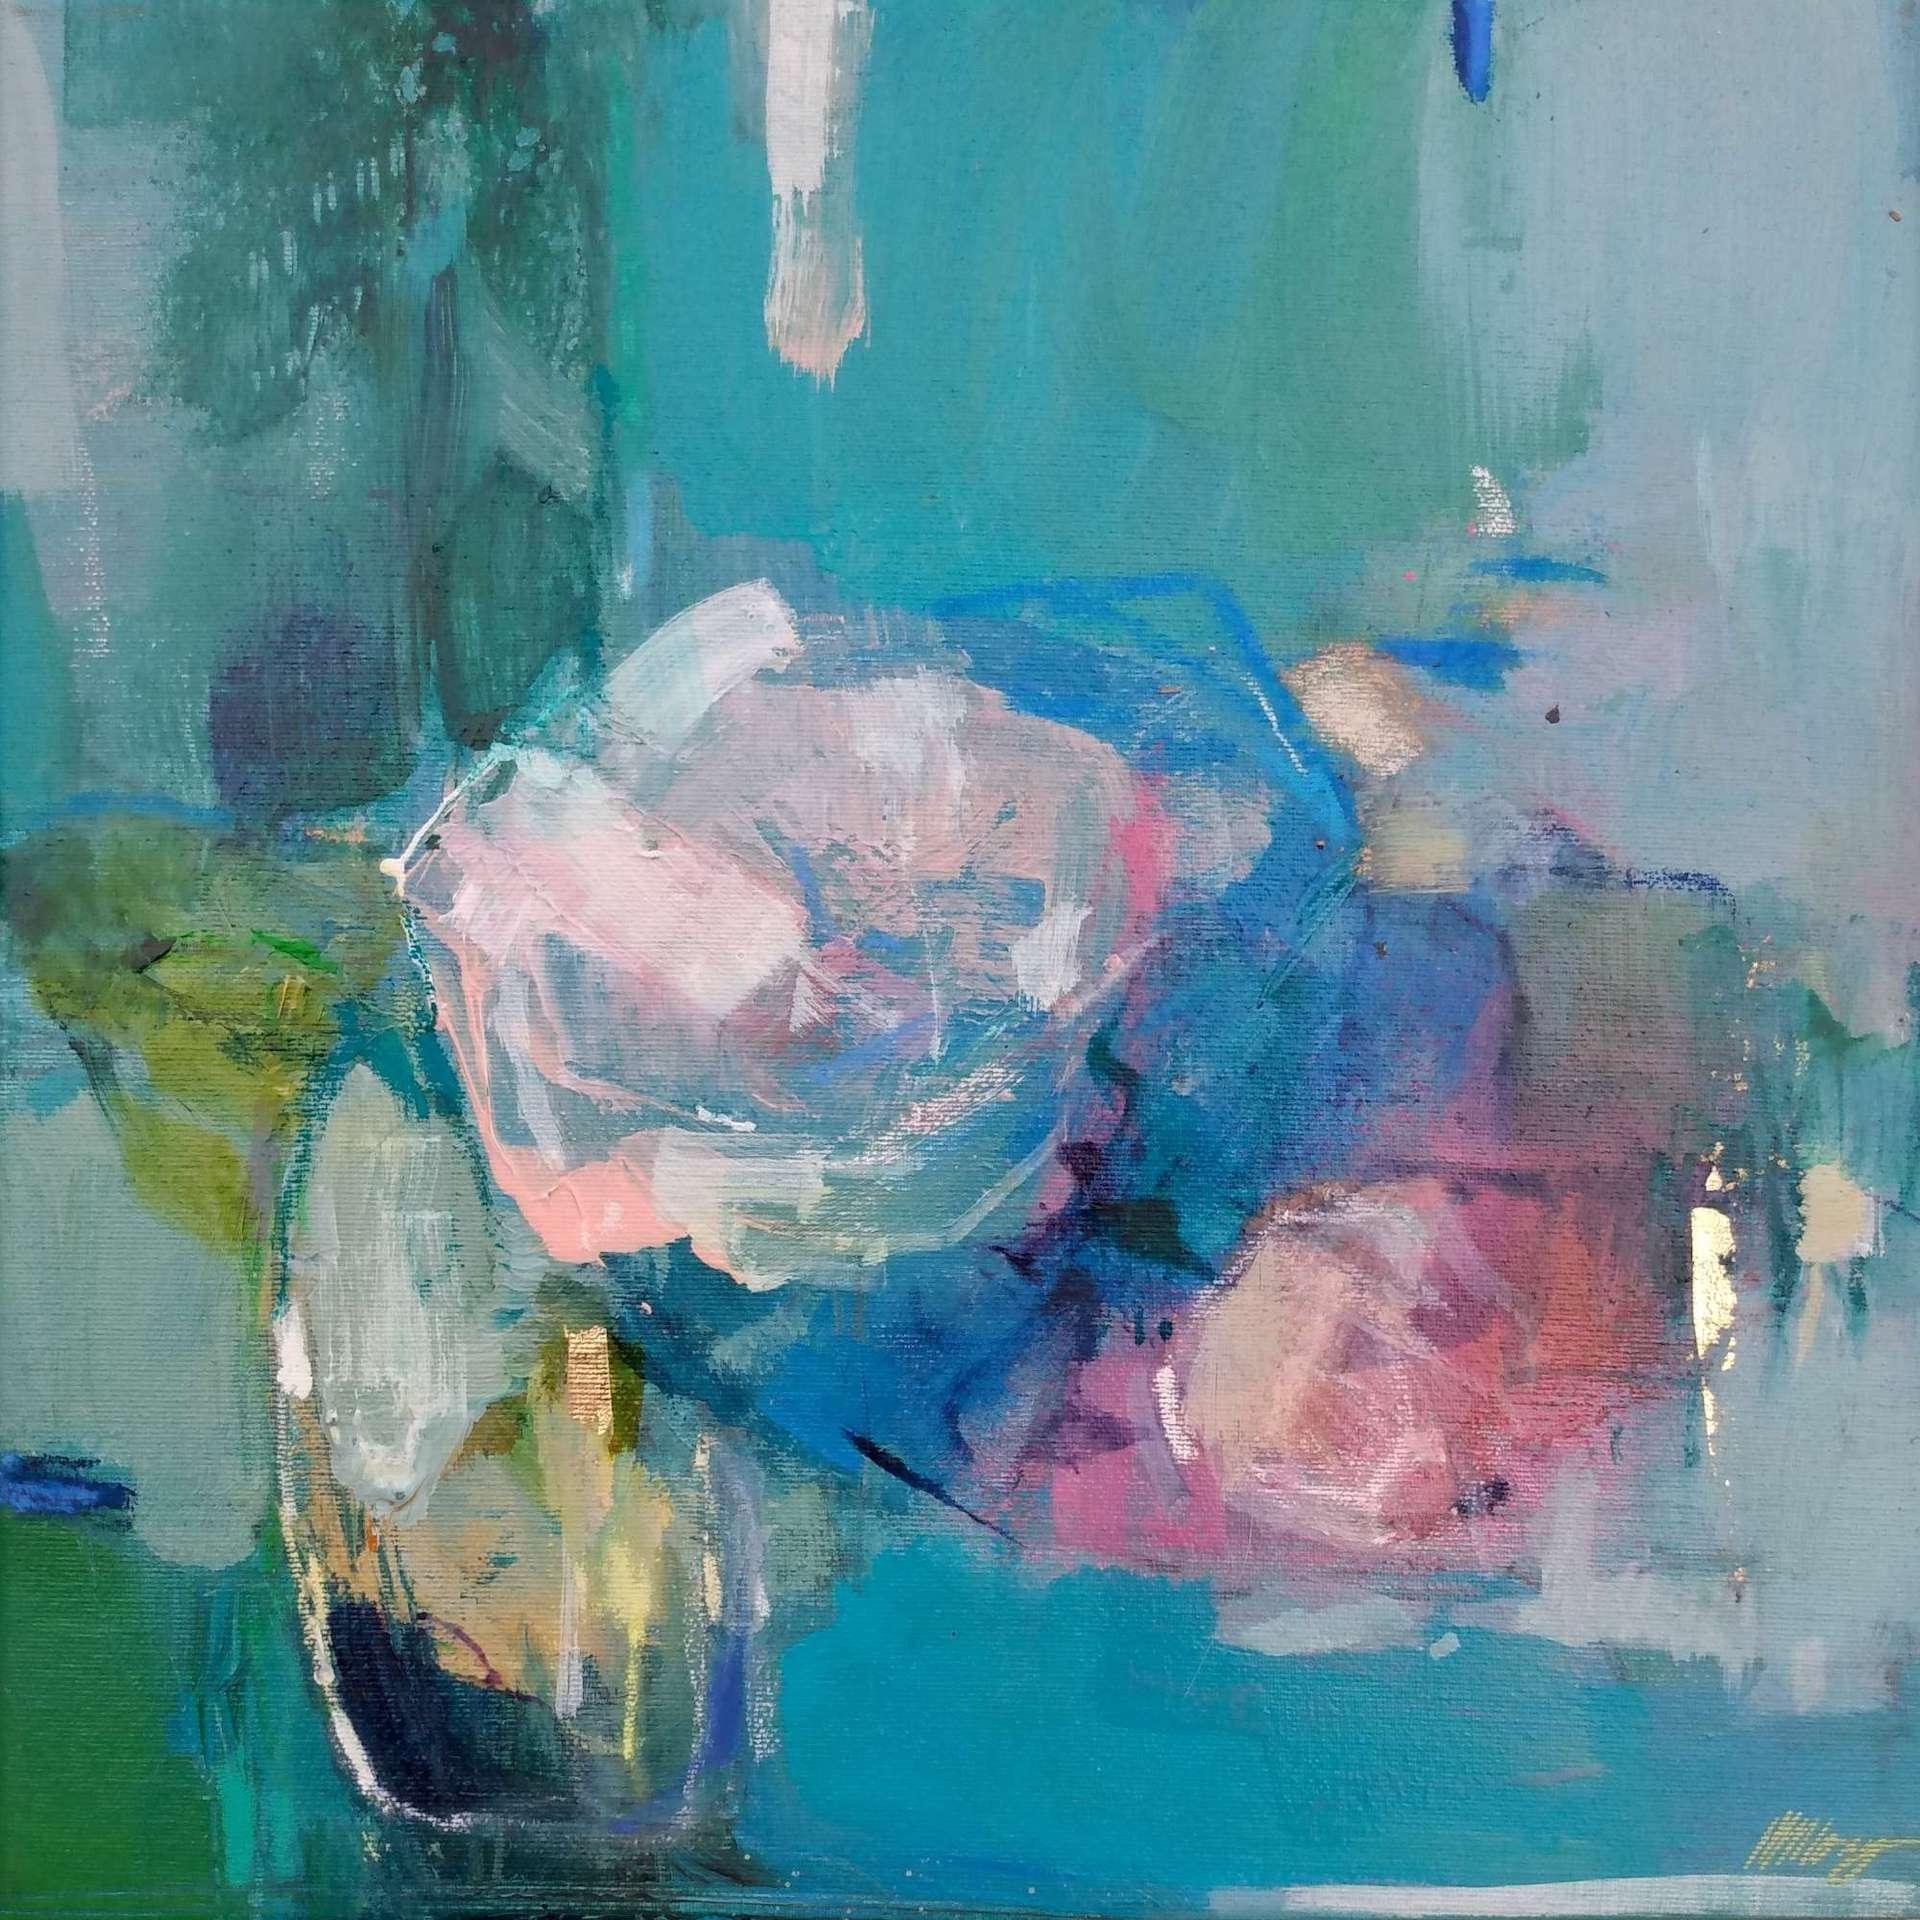 Magdalena Morey, Spring Blooms 2. Contemporary Still Life Painting, Affordable